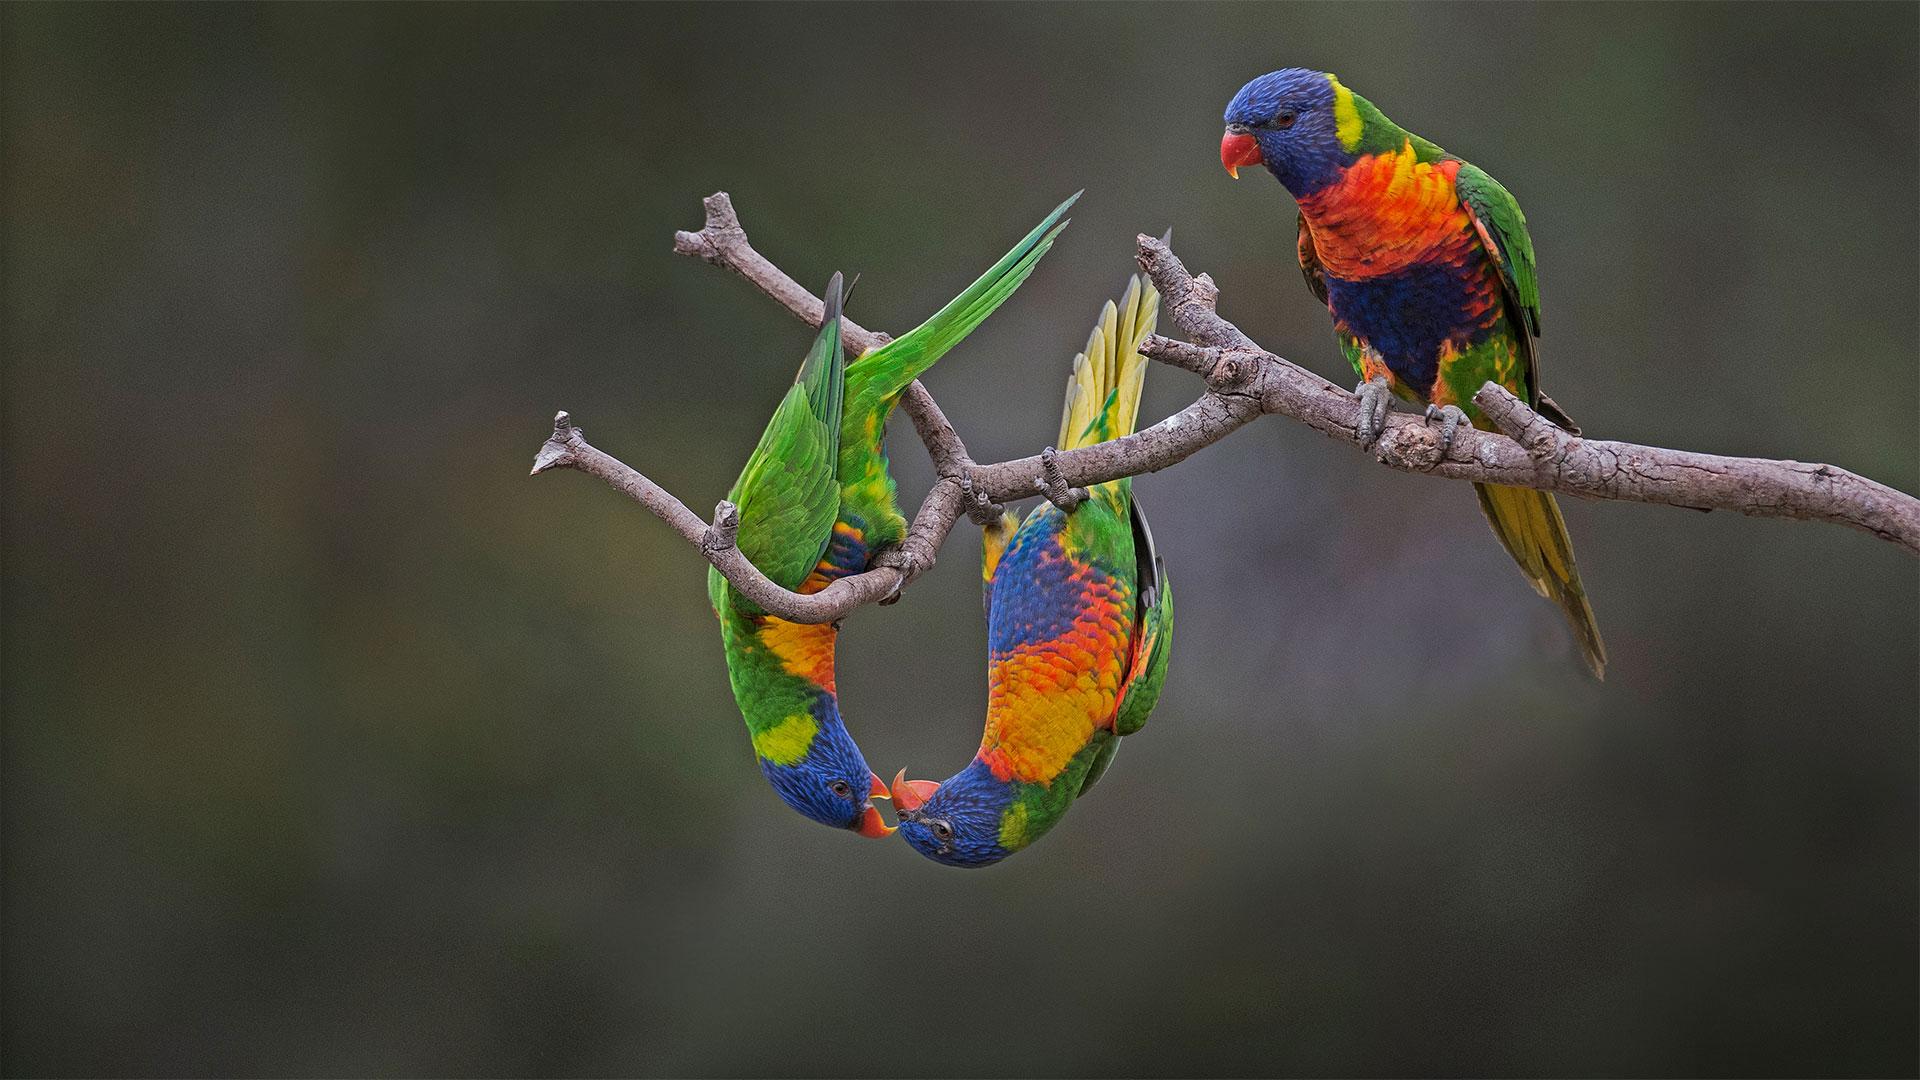 Rainbow lorikeets in Wer…Powell/Minden Pictures)